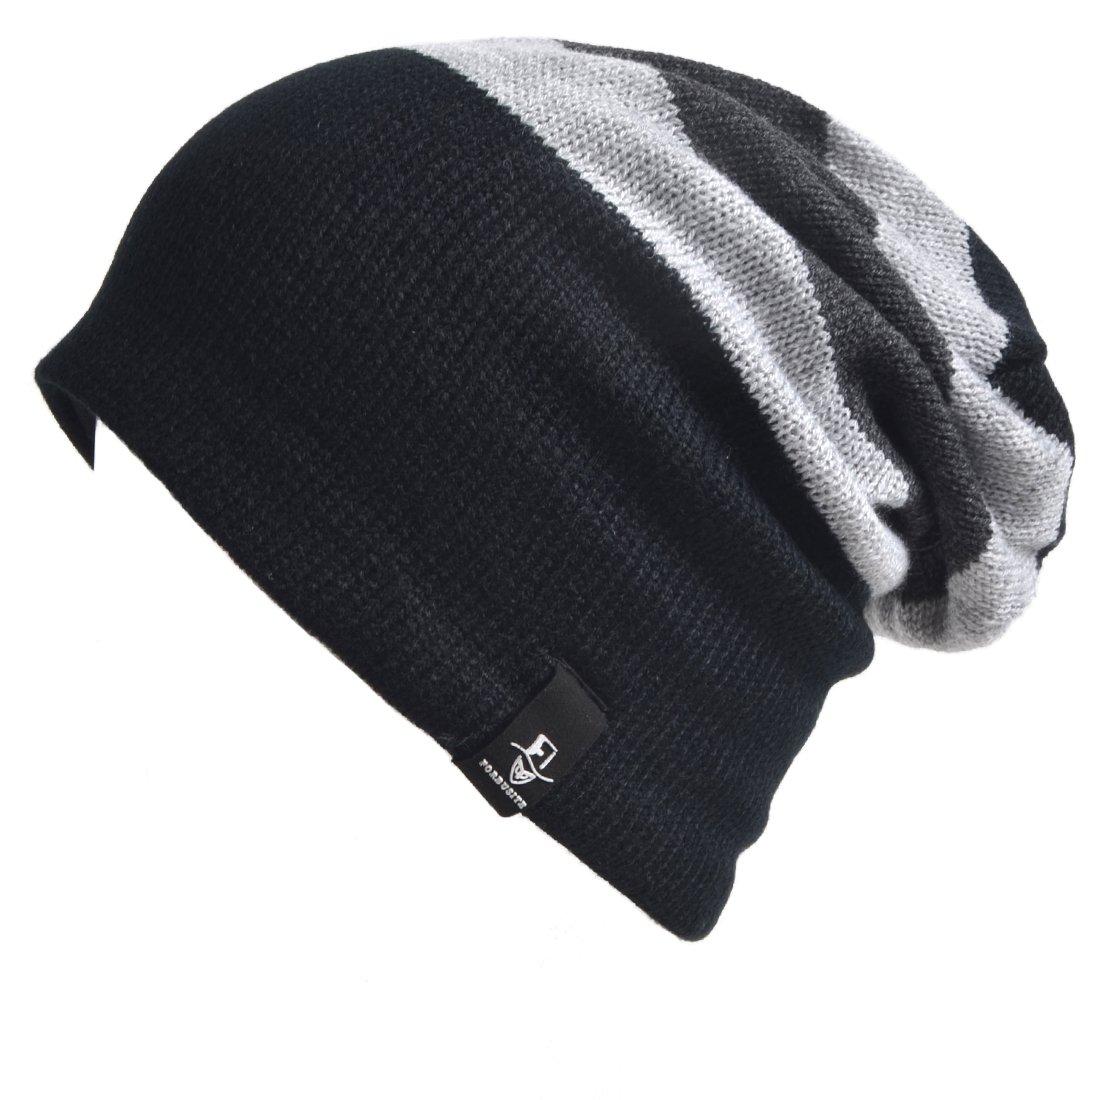 VECRY Trendy Baby Beanie Winter Hat Cute Kids Boys Girls Toddler Knitted Skull Cap F-B308k-Grey